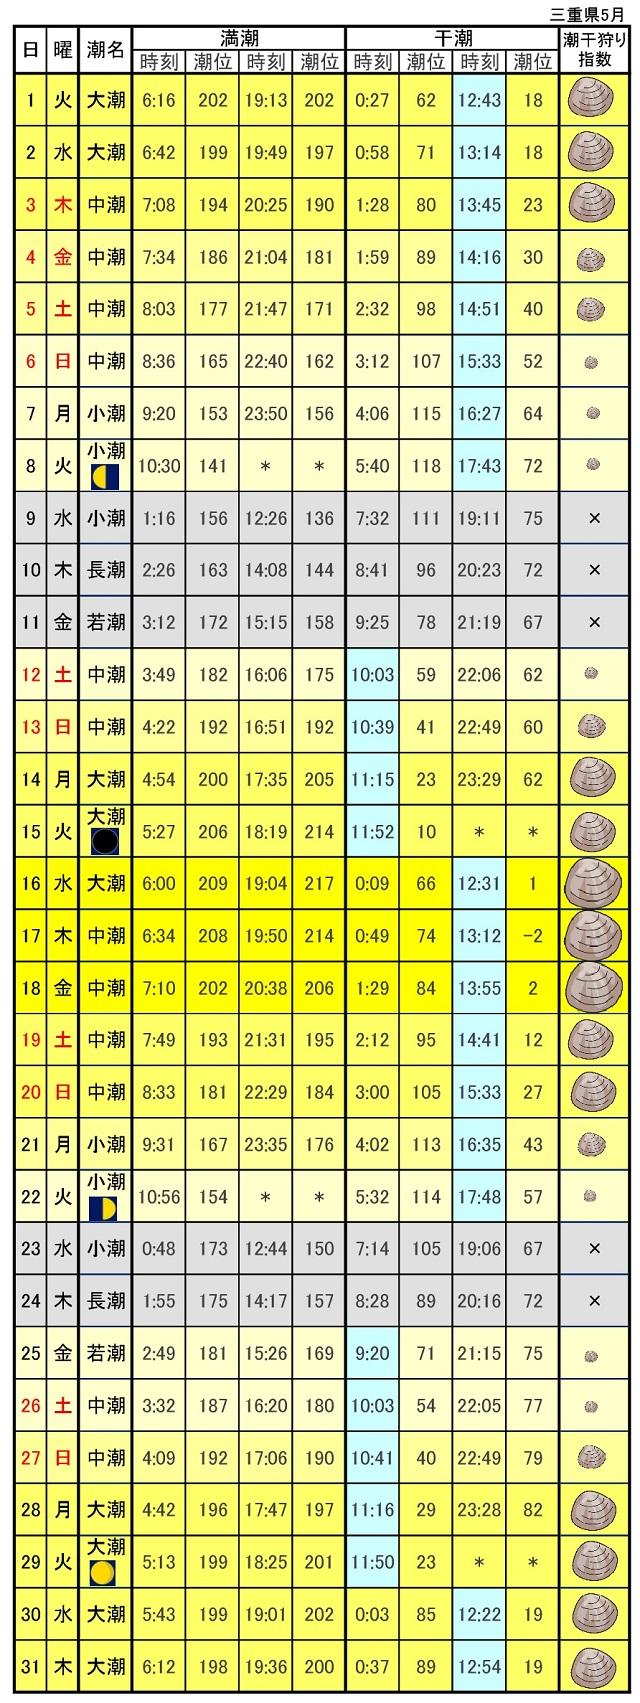 三重県潮干狩り指標2018年5月